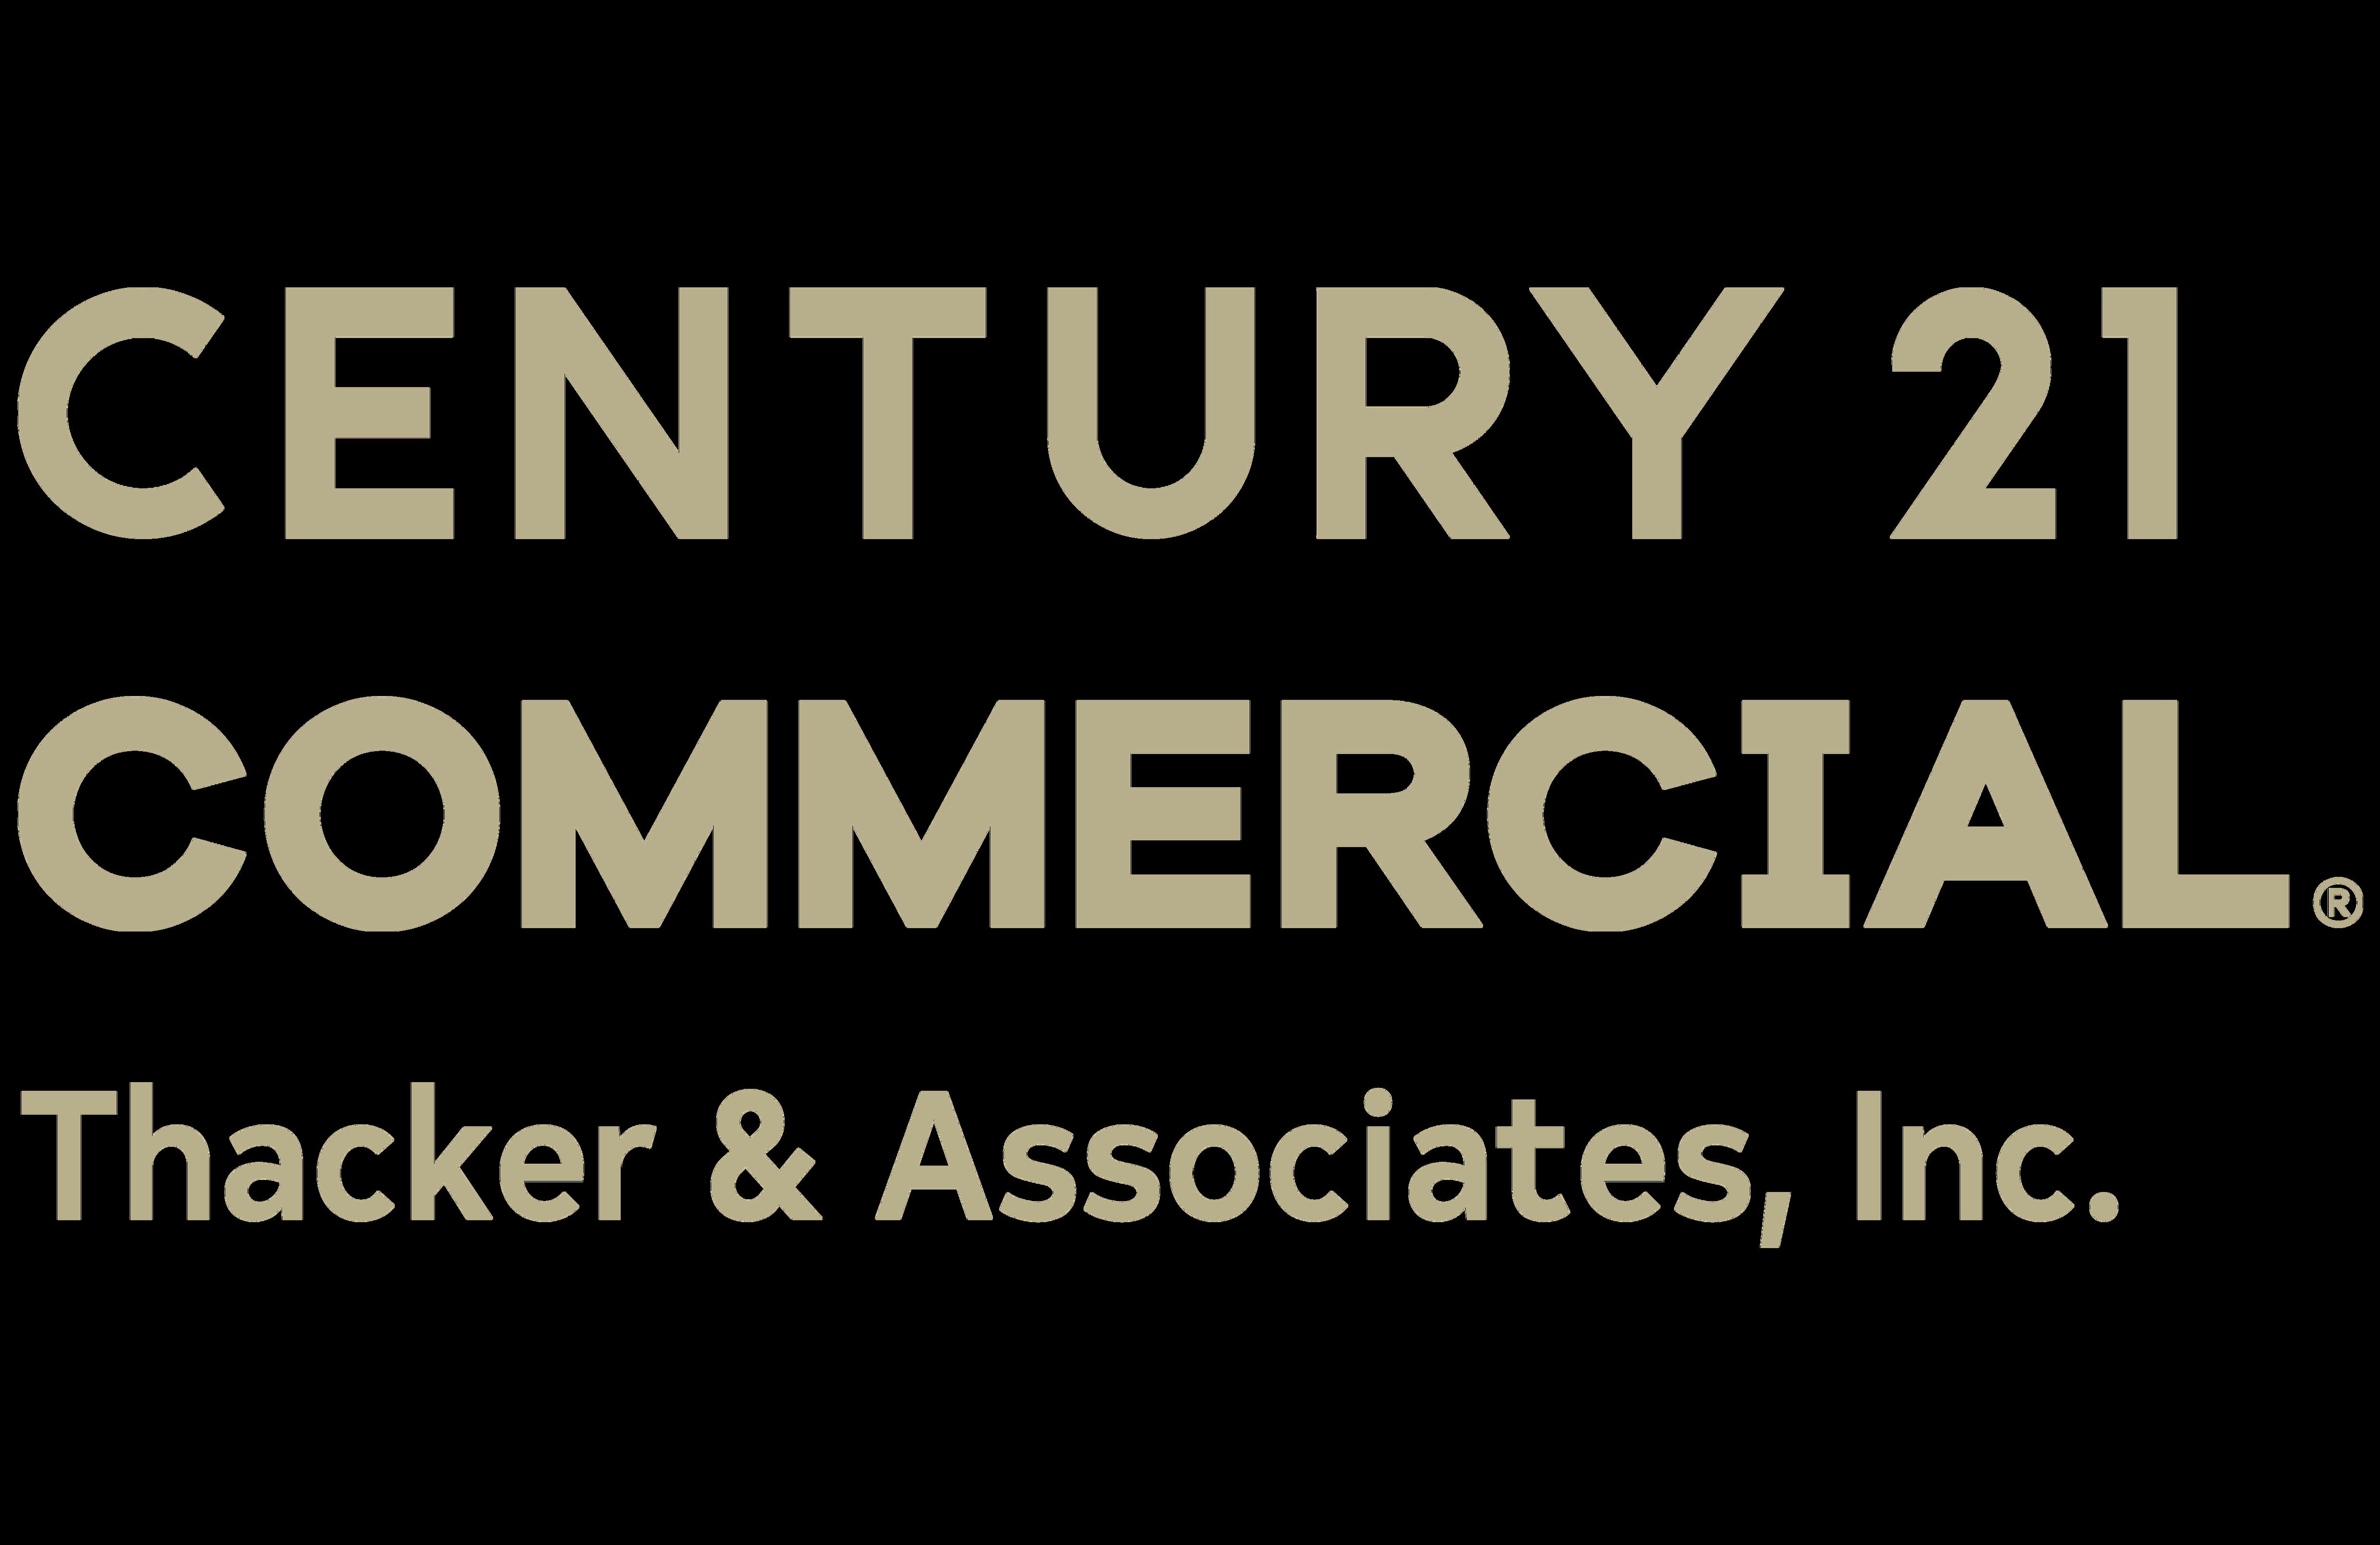 CENTURY 21 Thacker & Associates, Inc.